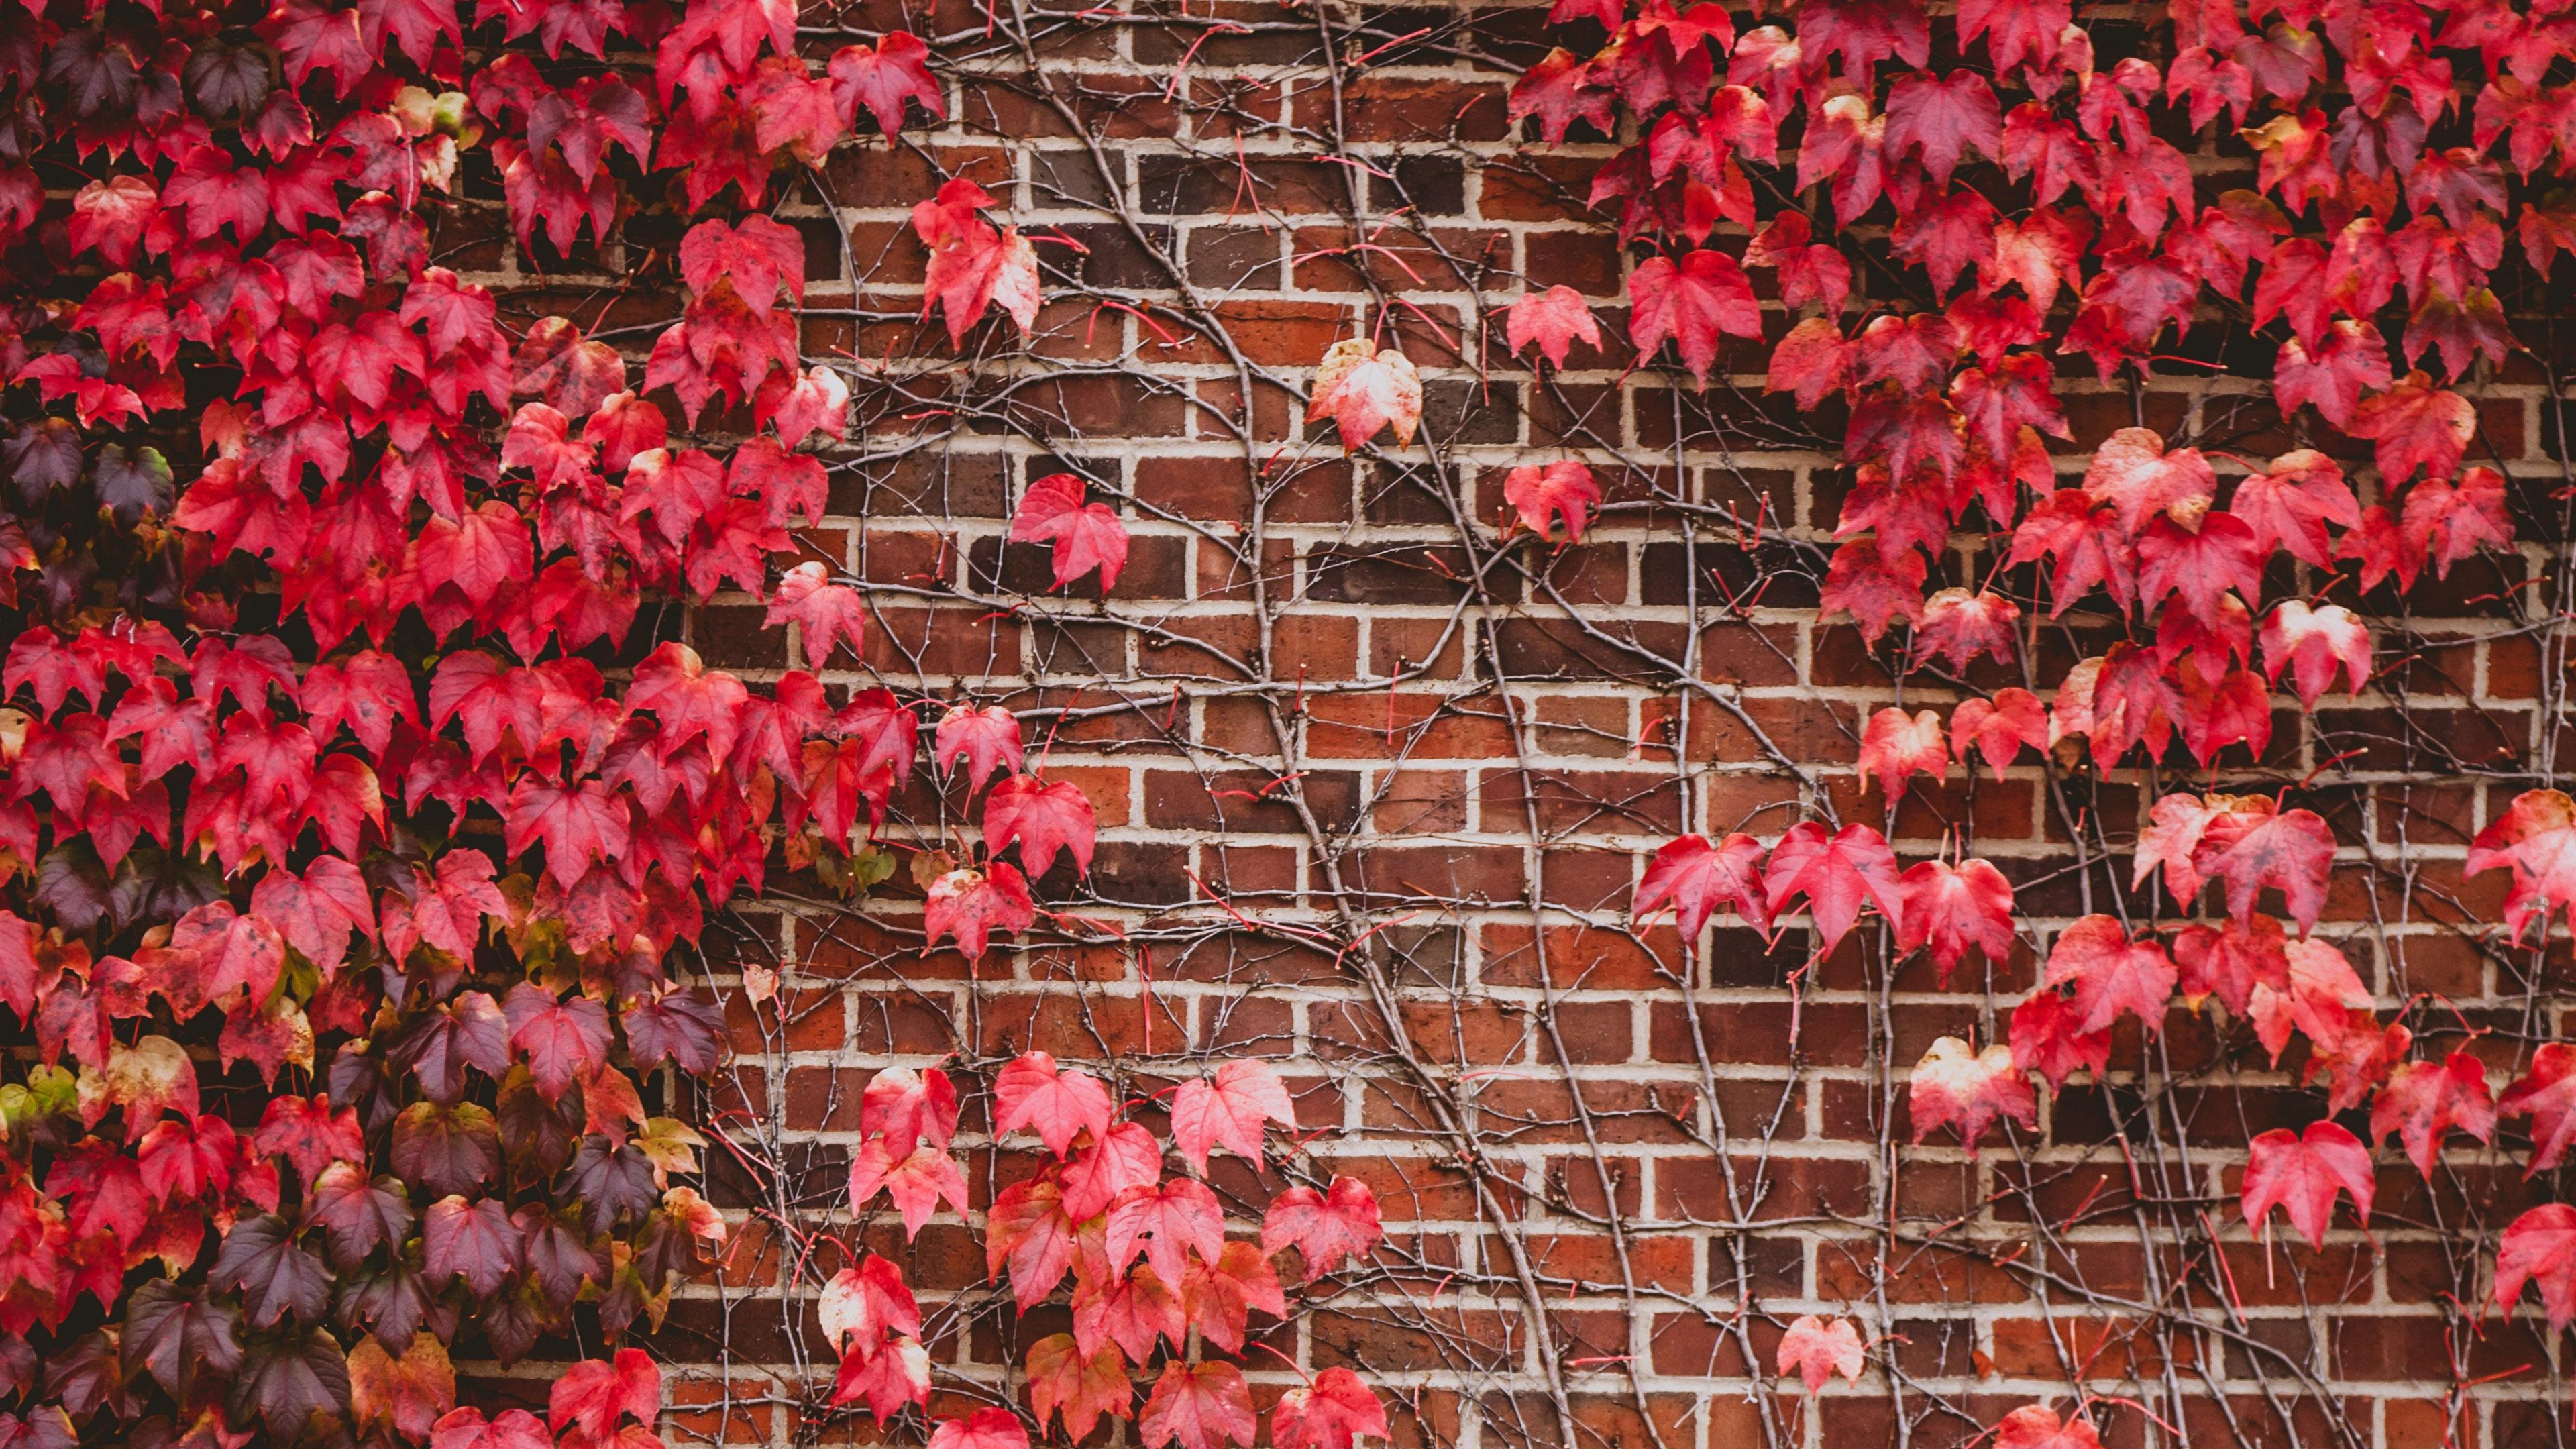 HDoboi.Kiev.ua - Ветви с красными листьями на кирпичной стене, заставки ultra hd 4k